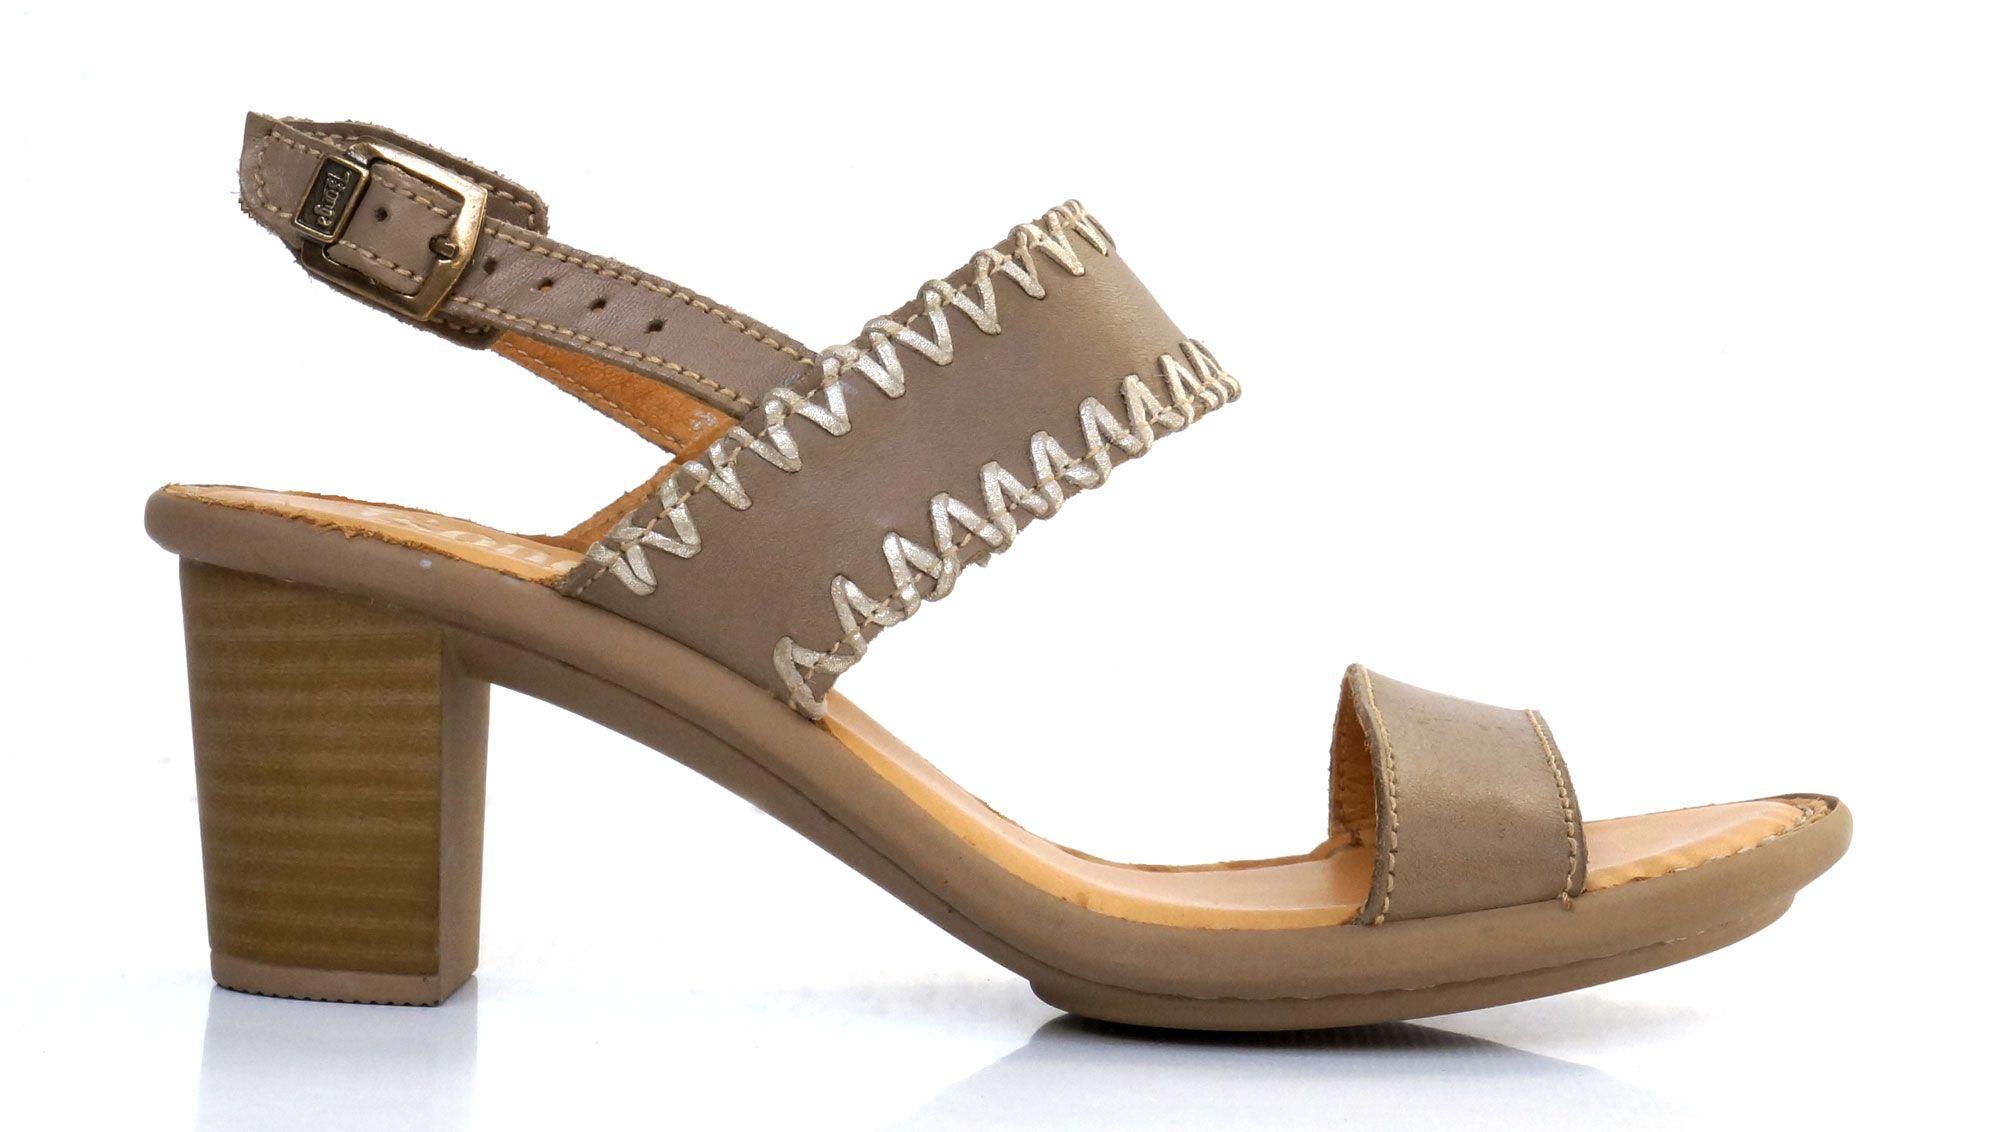 Tsonga Rayisi Donkey Bark Genuine Leather Medium Heel Sandal R 879 Handcrafted In South Africa Code Tlqa004 004 Leather Shoes Woman Handcrafted Shoes Heels